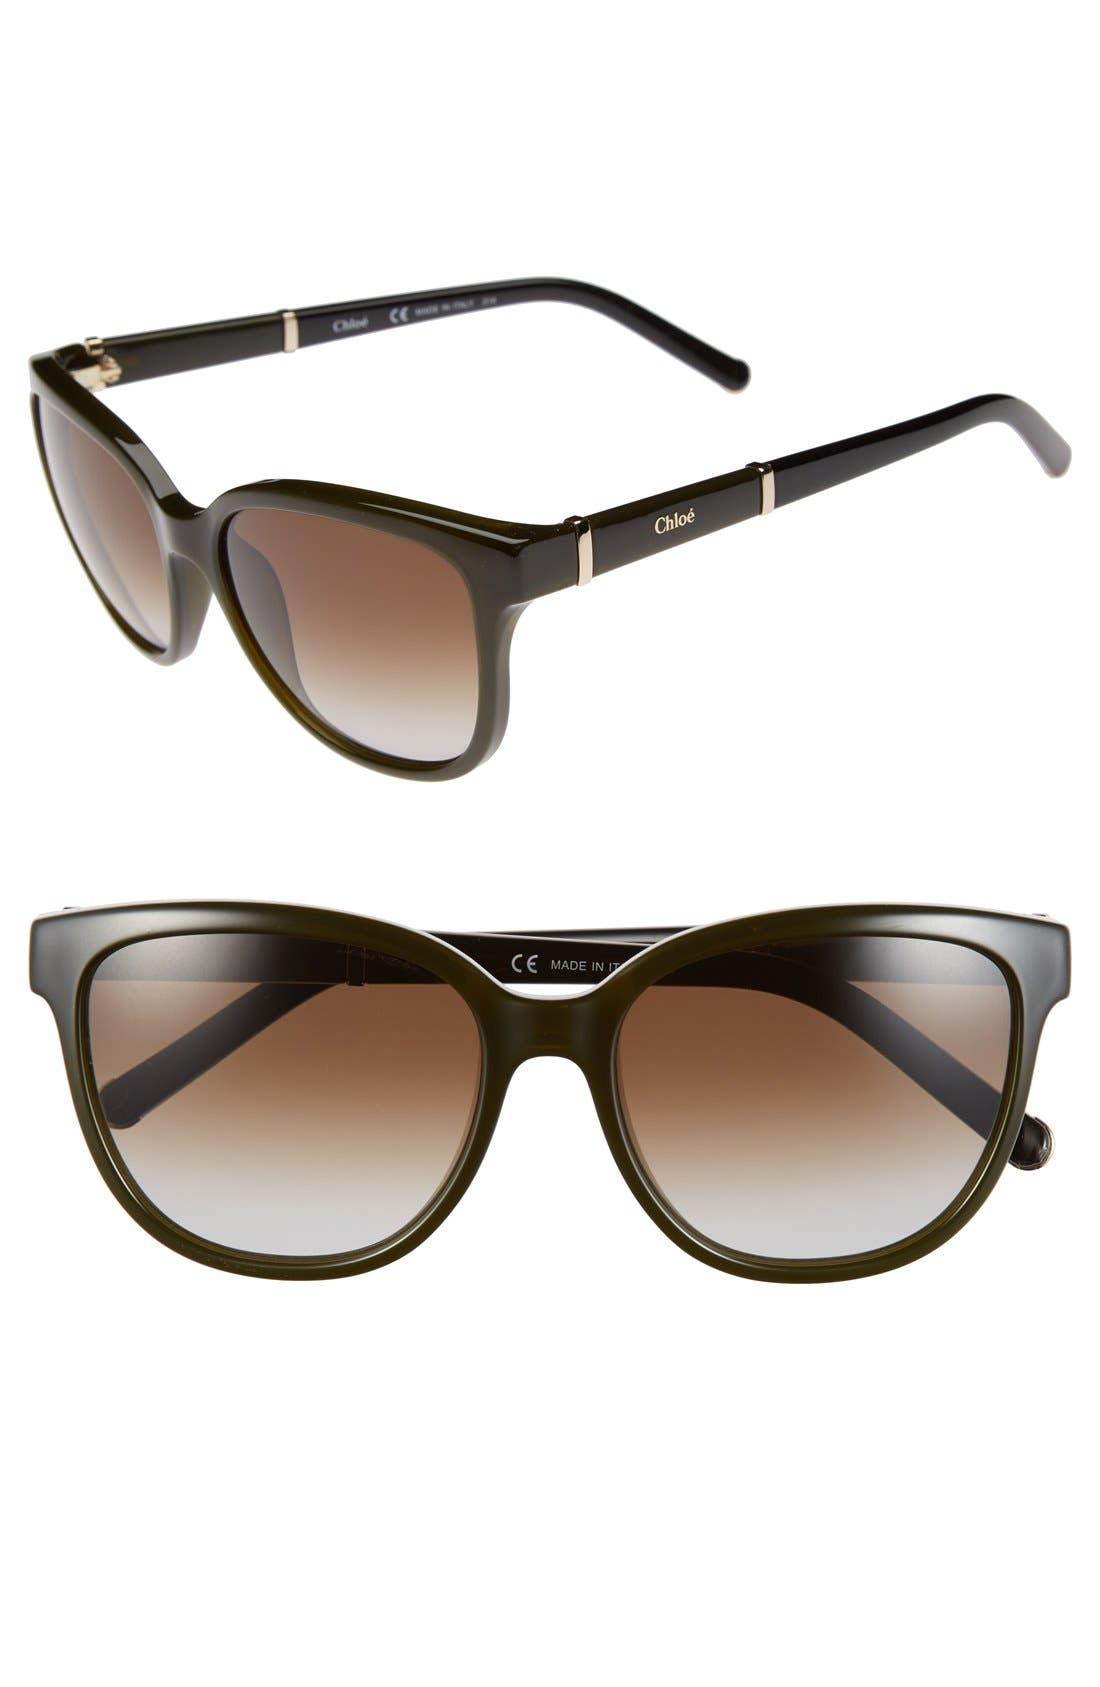 Main Image - Chloé 'Daisy' 54mm Sunglasses